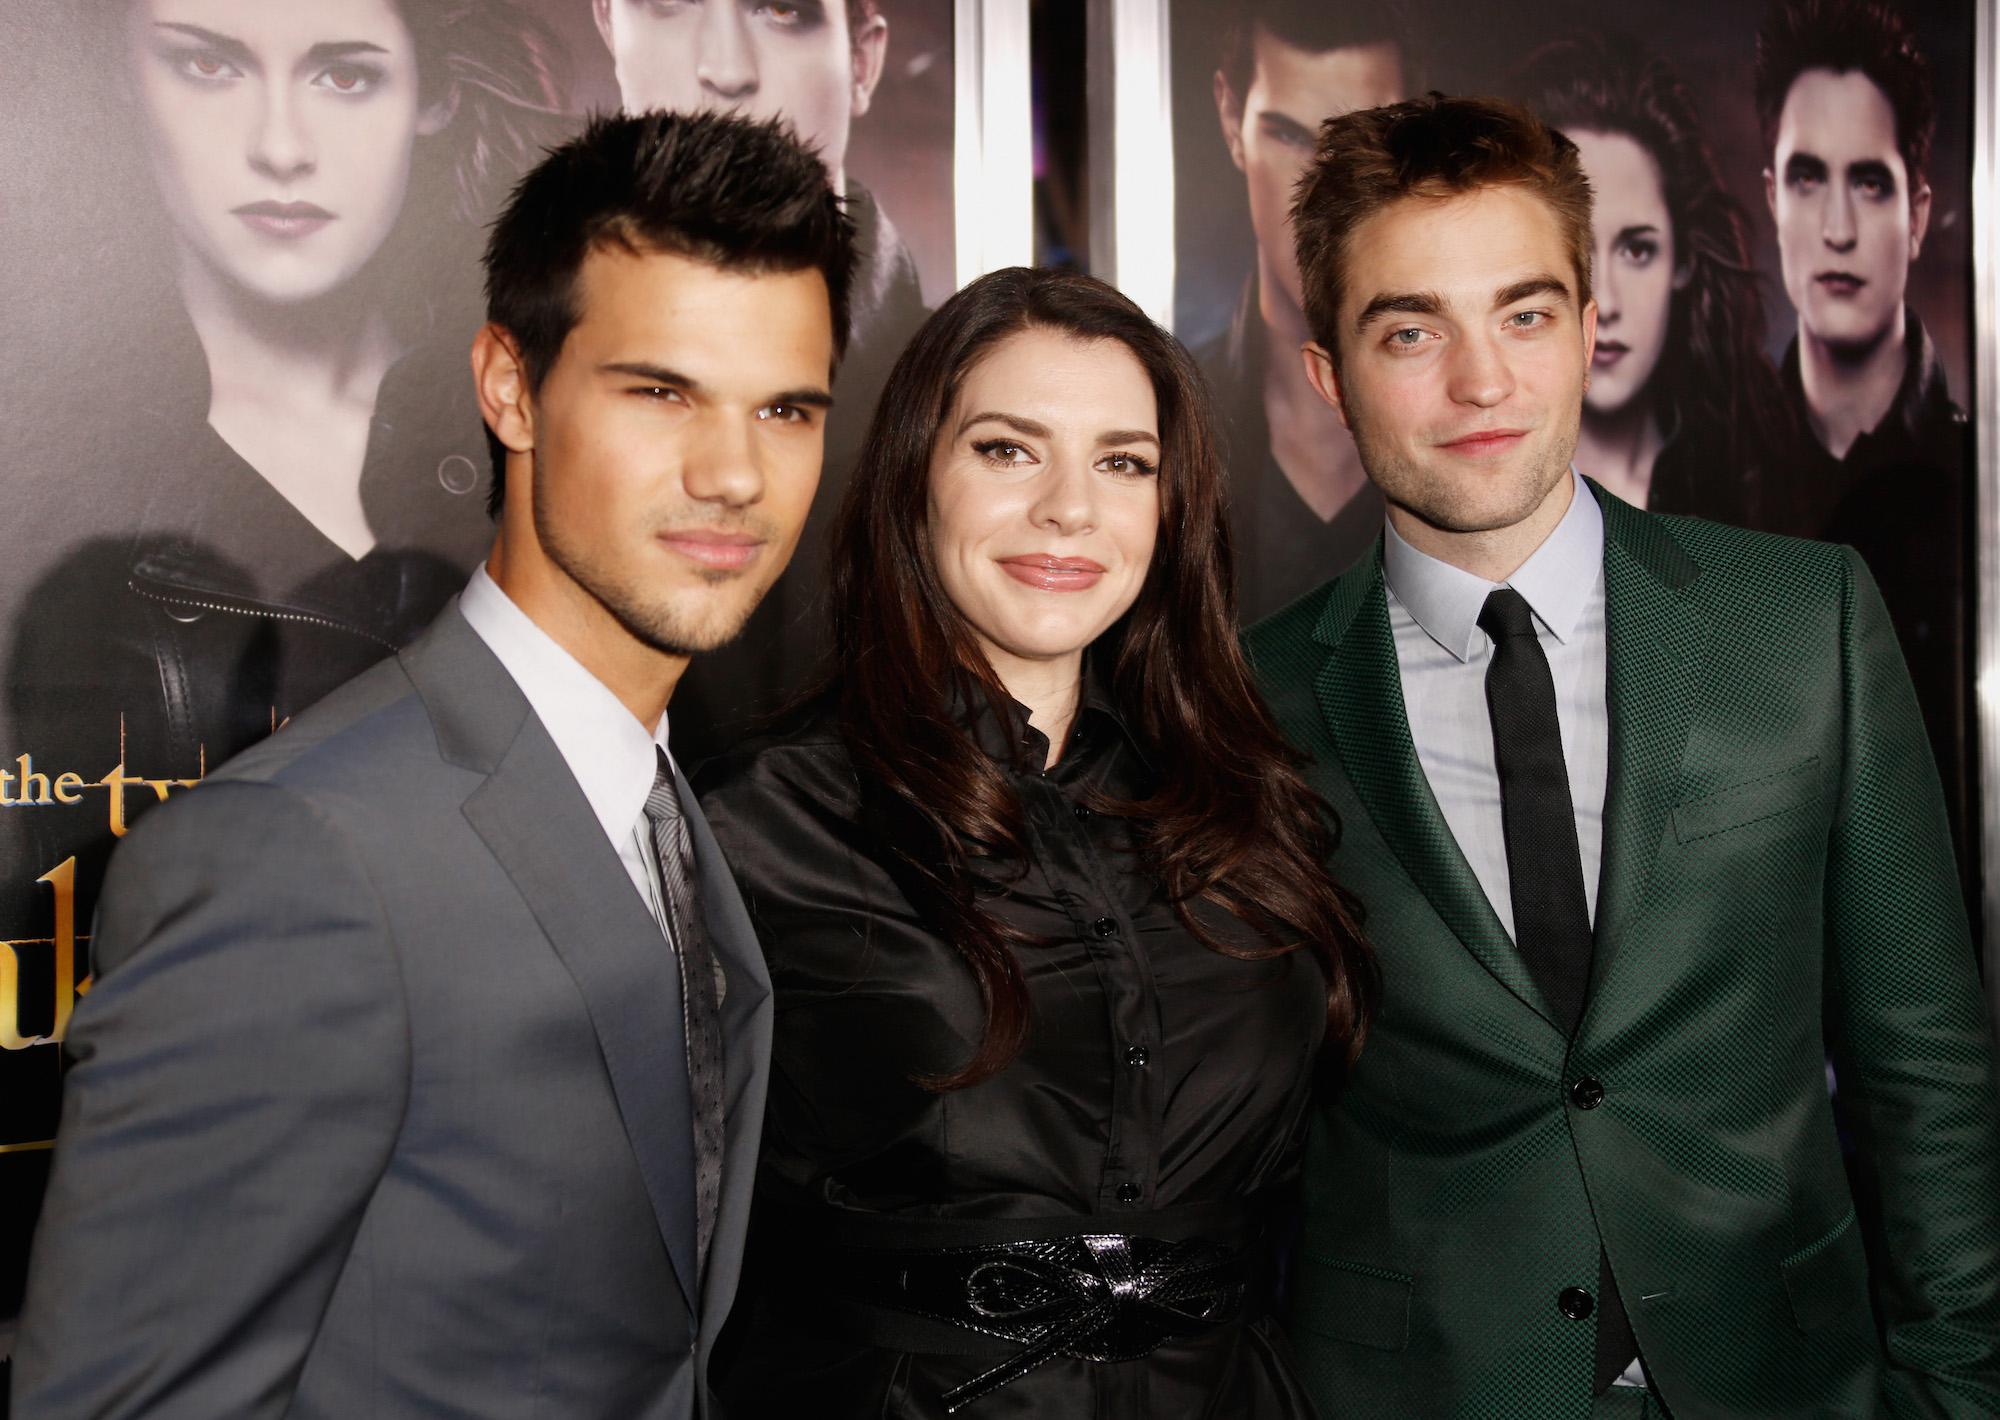 Taylor Lautner, Stephenie Meyer, and Robert Pattinson at 'The Twilight Saga: Breaking Dawn - Part 2' Los Angeles premiere on November 12, 2012.